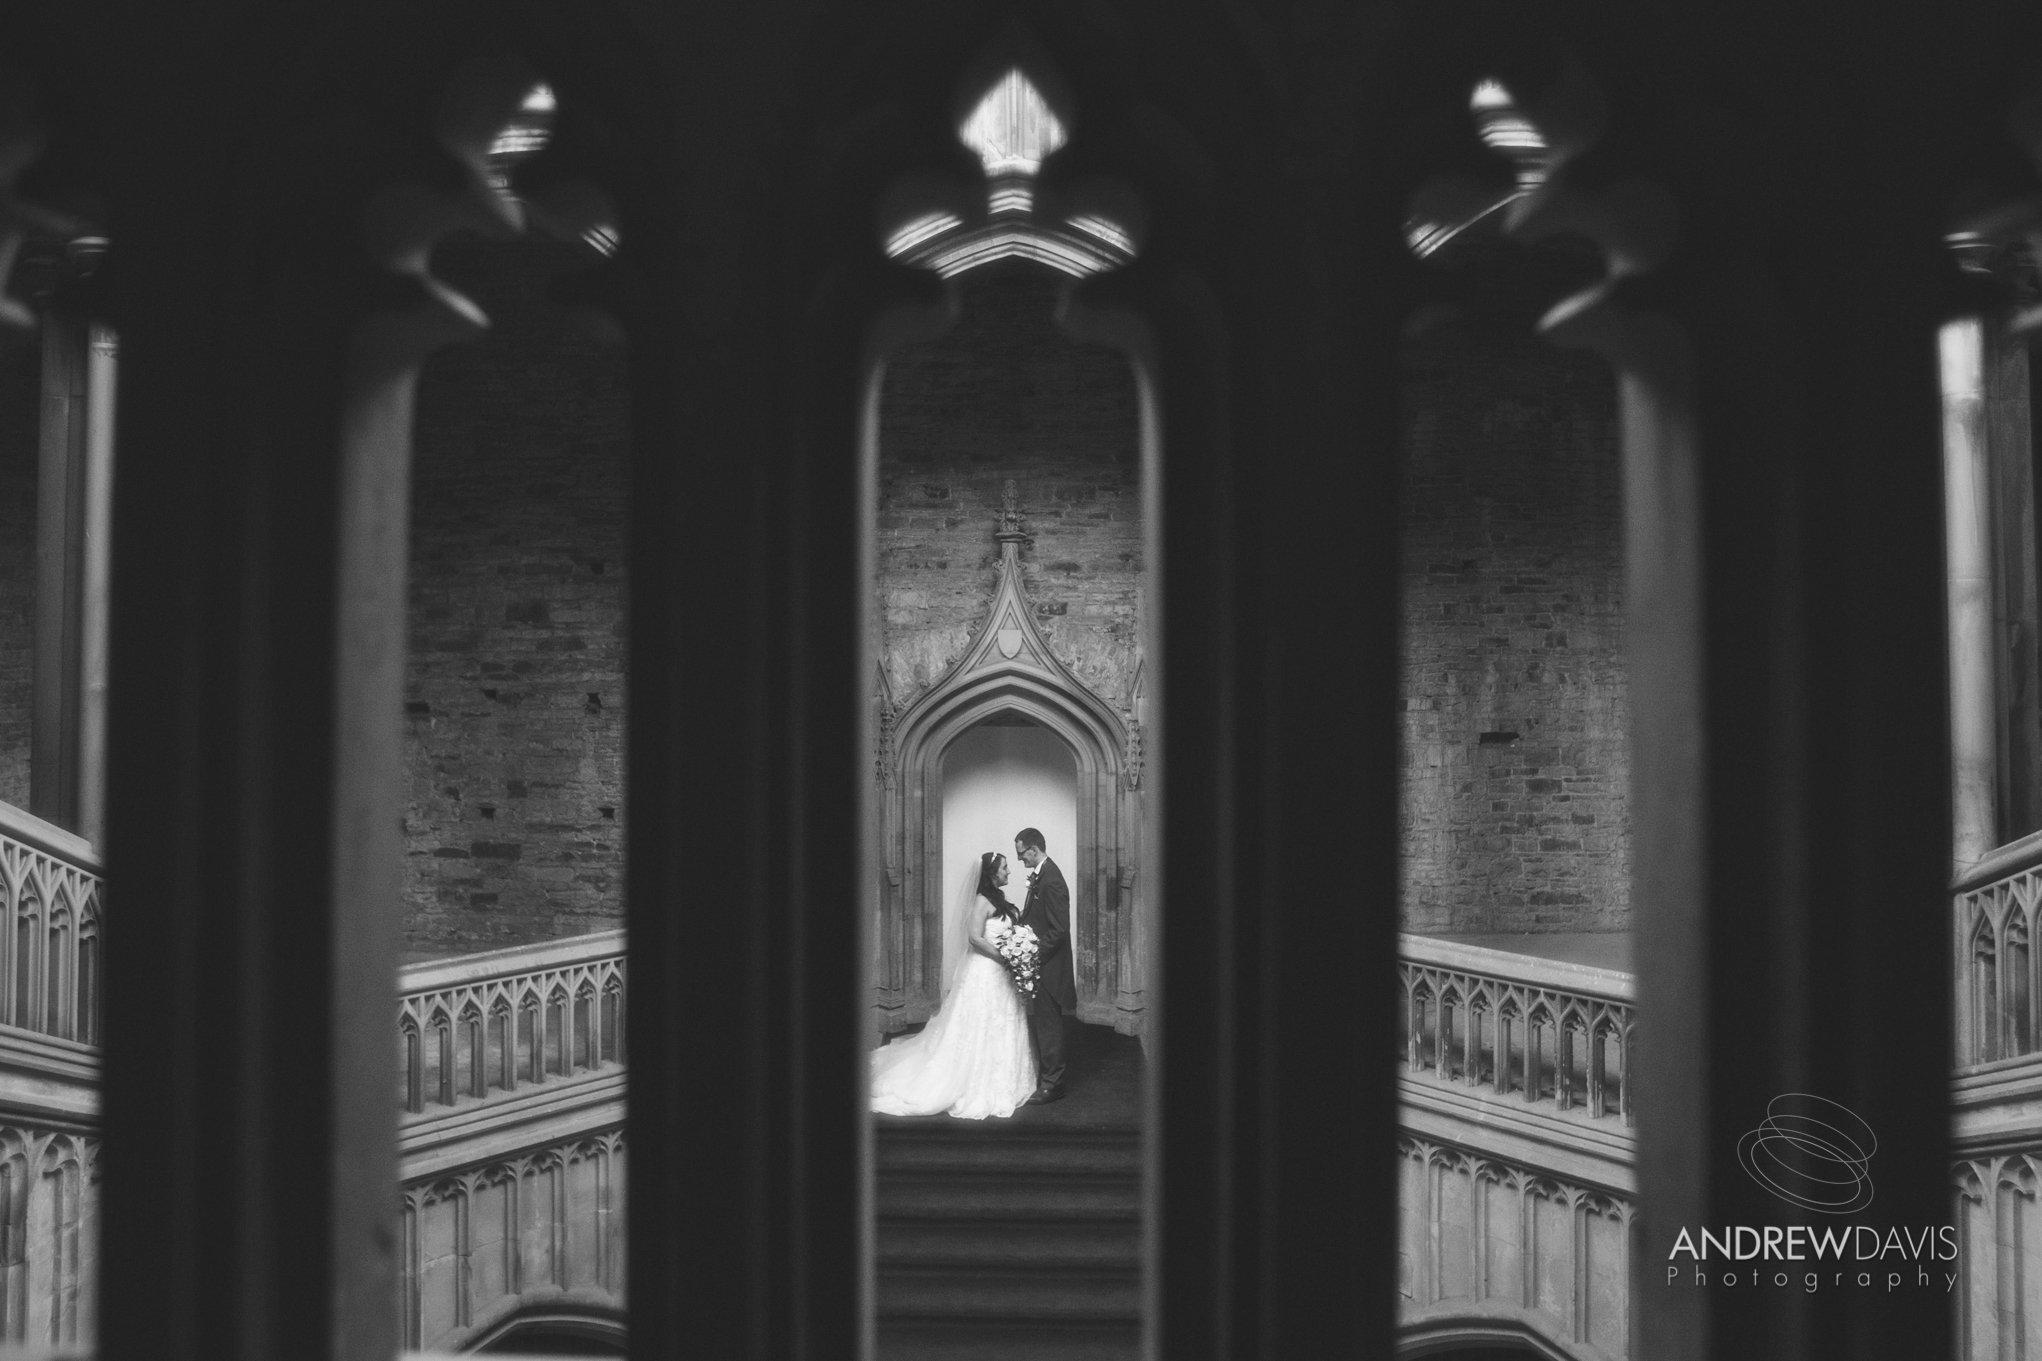 Samantha & Michael at Margam Castle. By Andrew Davis Photography, Pencoed near Bridgend